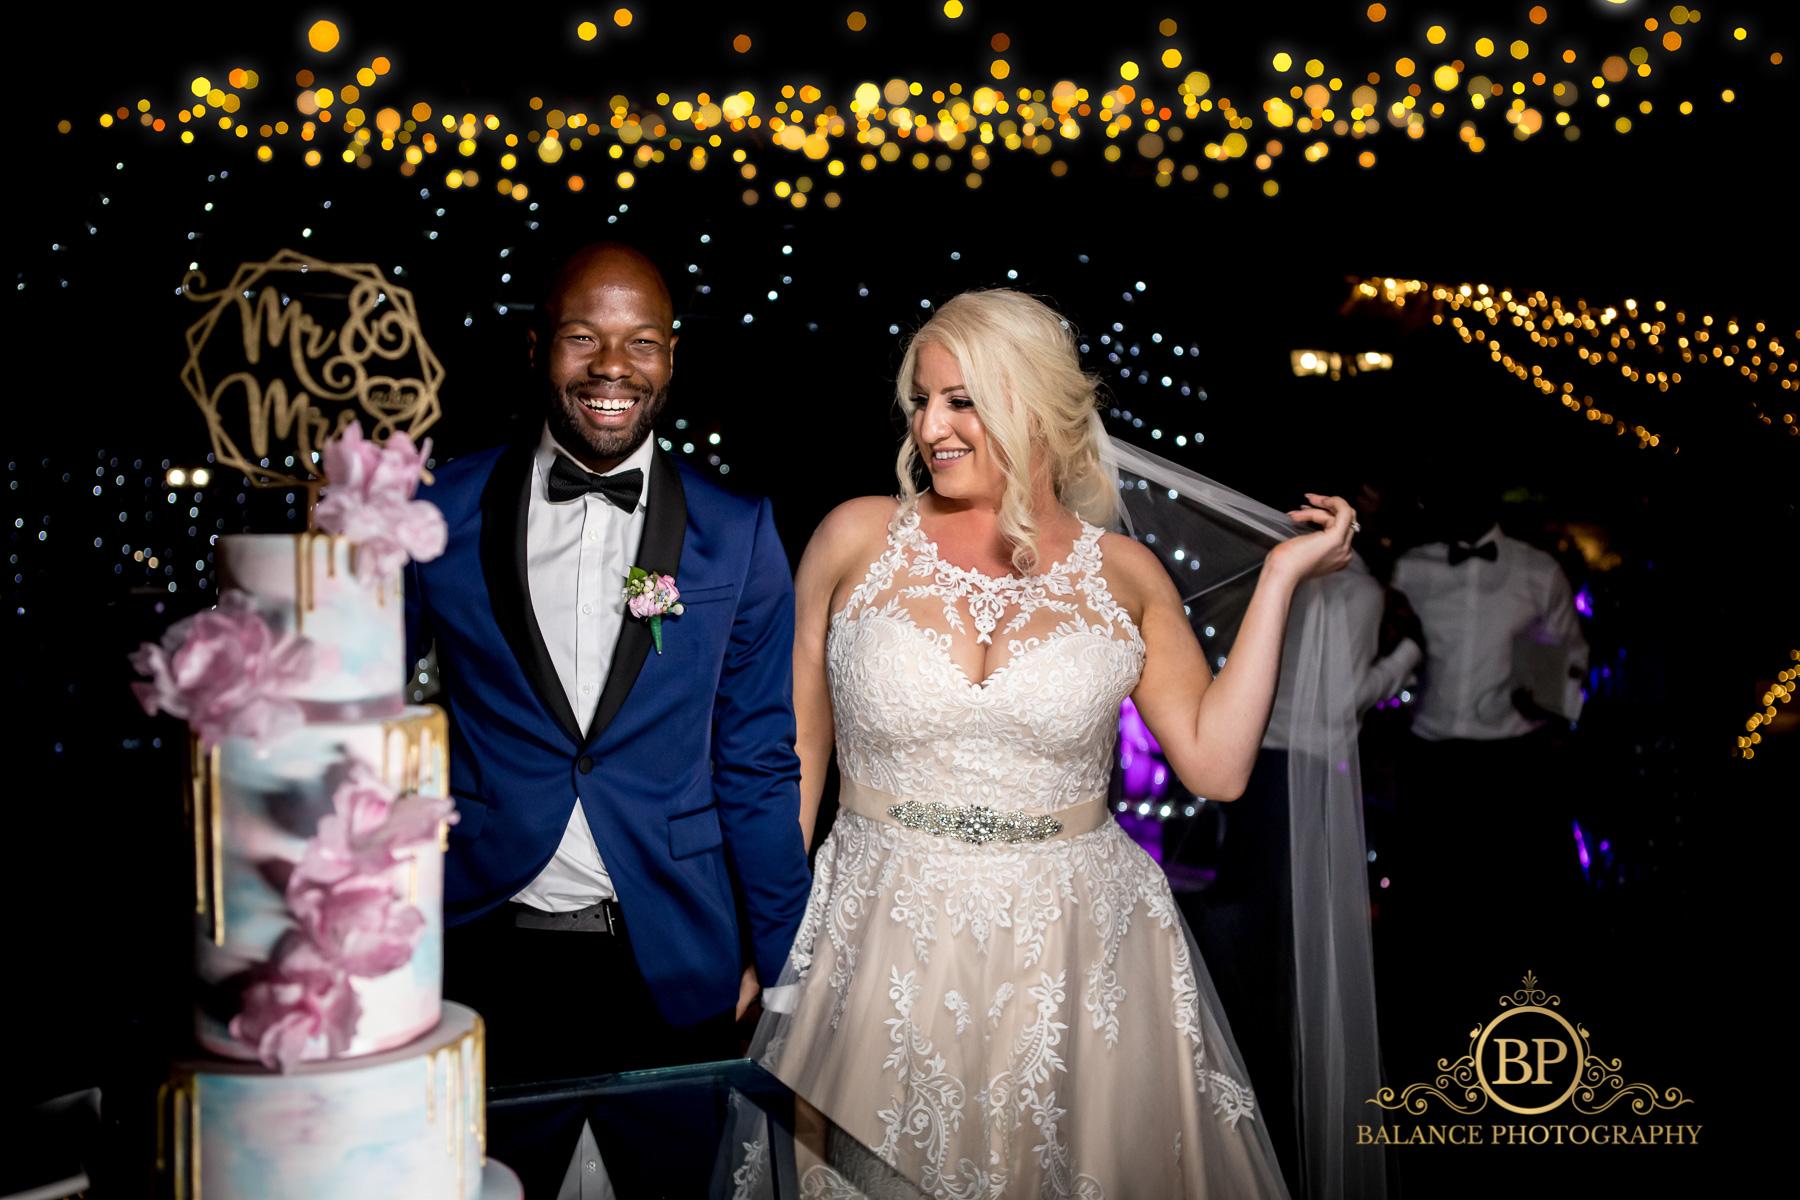 Bride, groom, and one majestic wedding cake - Balance Photography